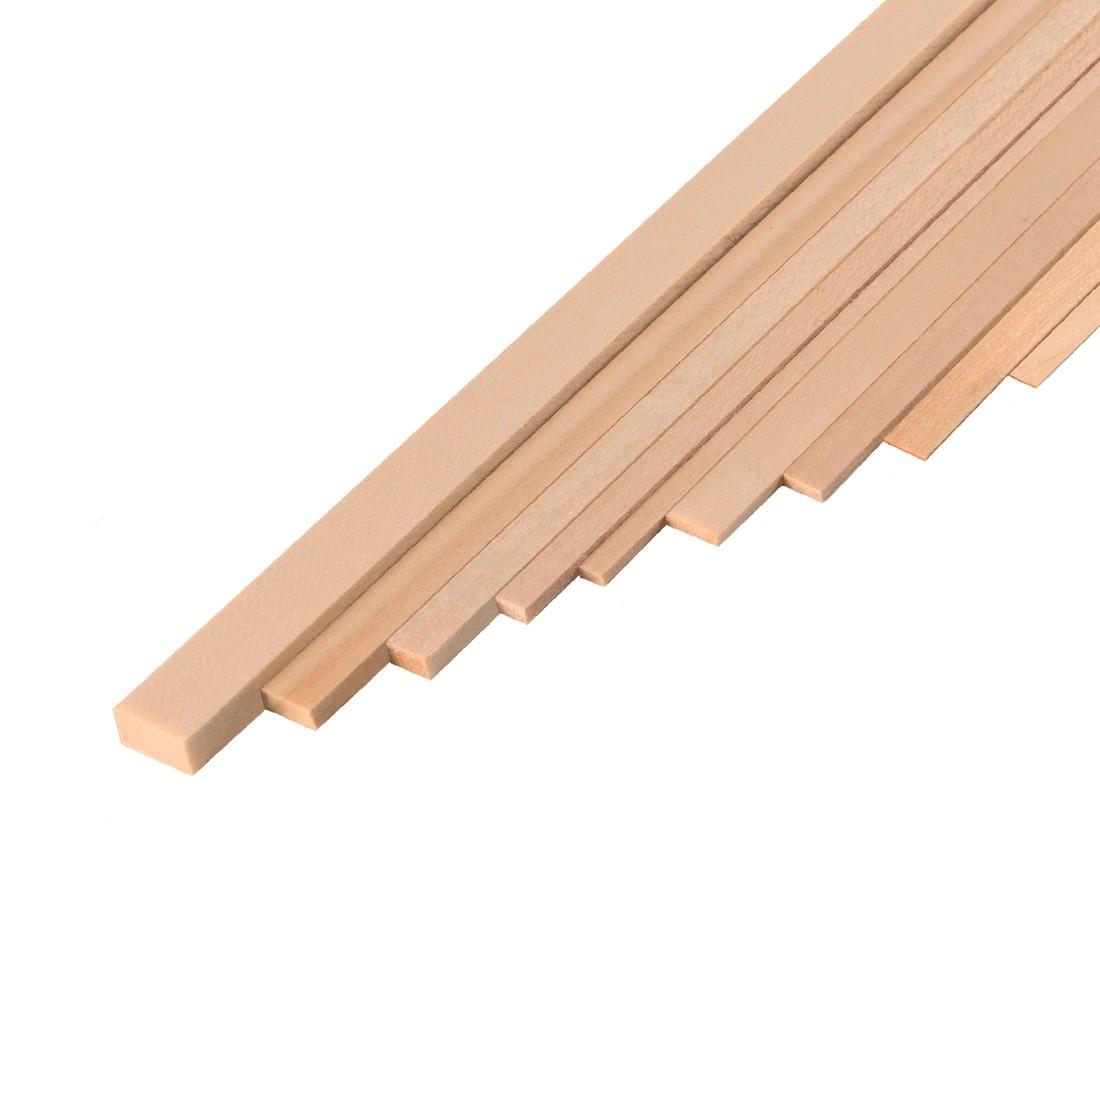 Limewood strip 0,5x6